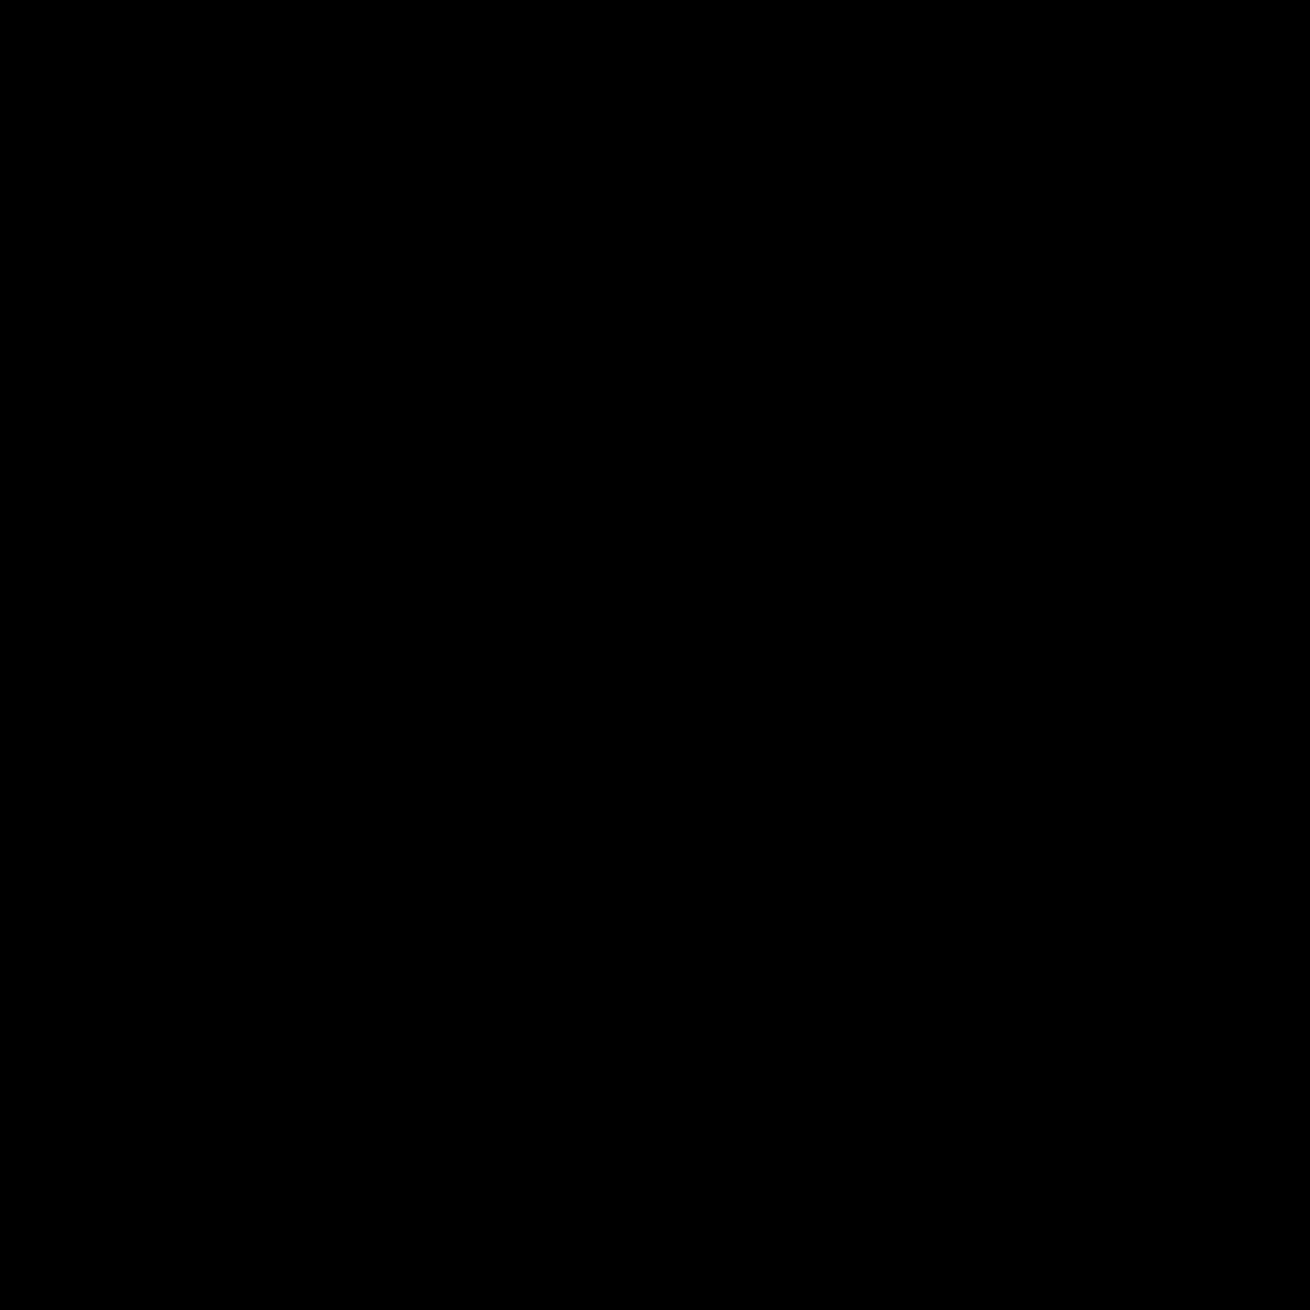 finalBig-black-transp